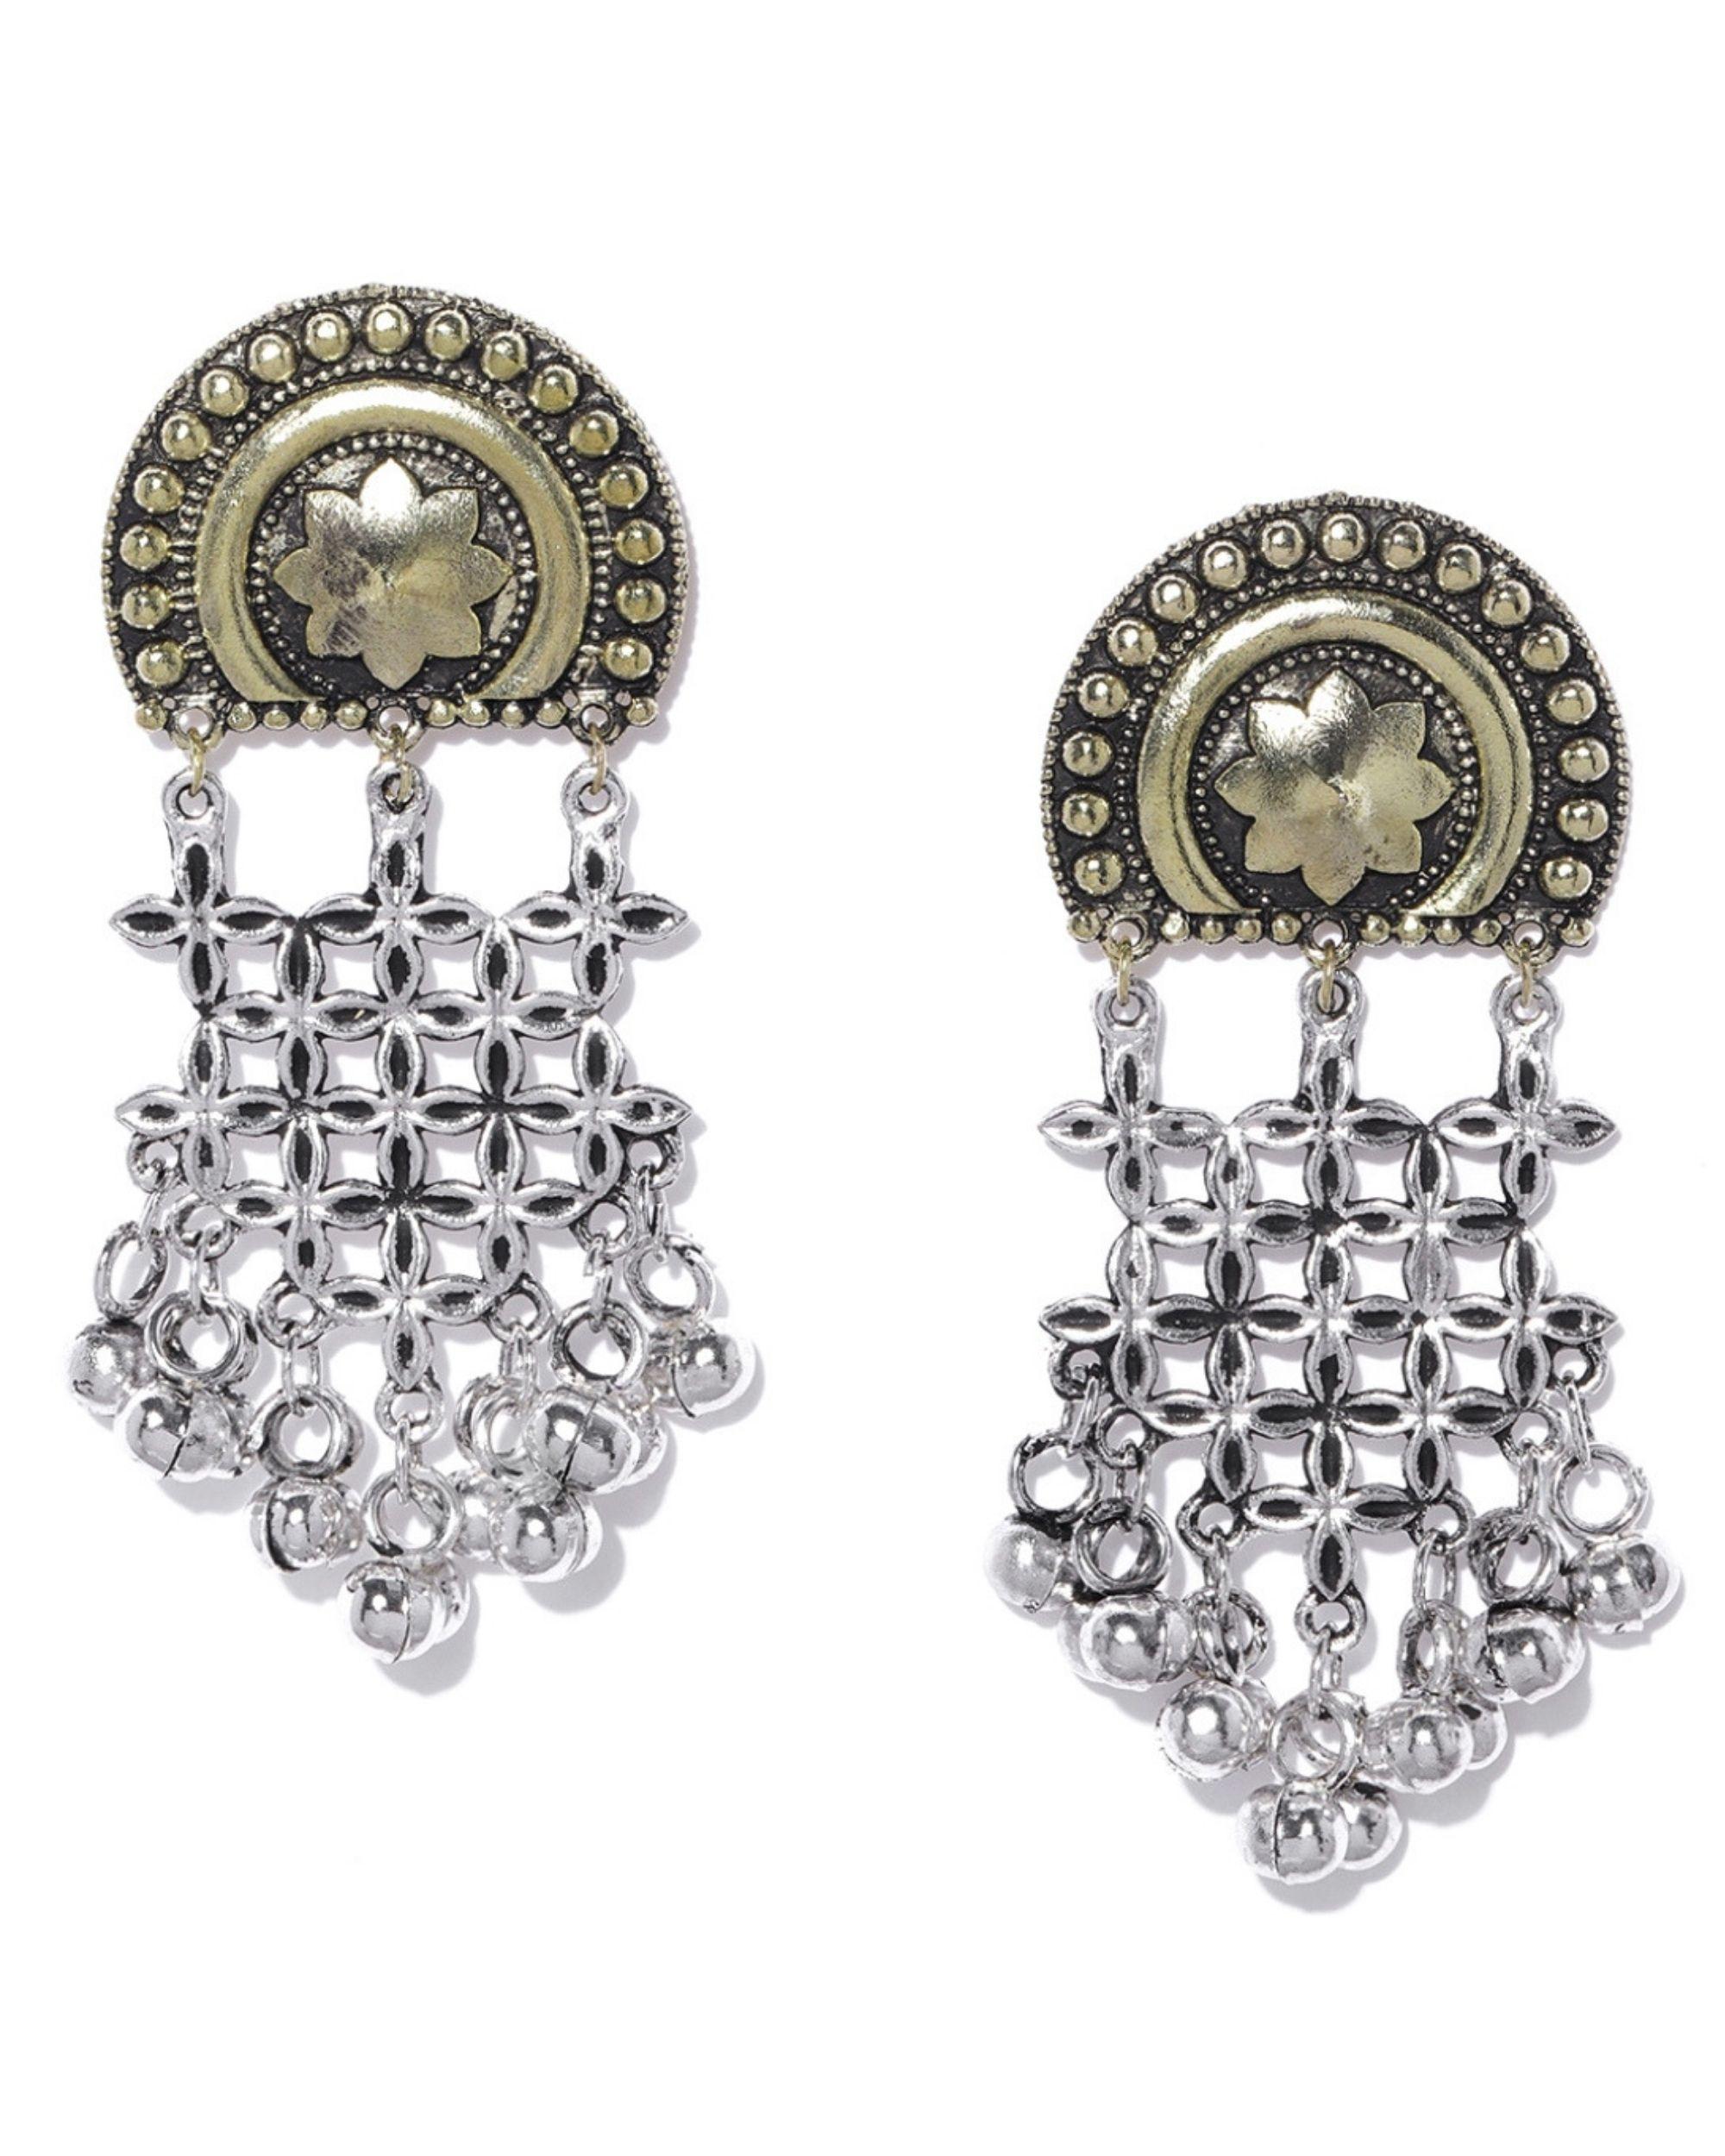 2dba04327 Oxidised silver toned gold classic drop earrings by Infuzze   The Secret  Label